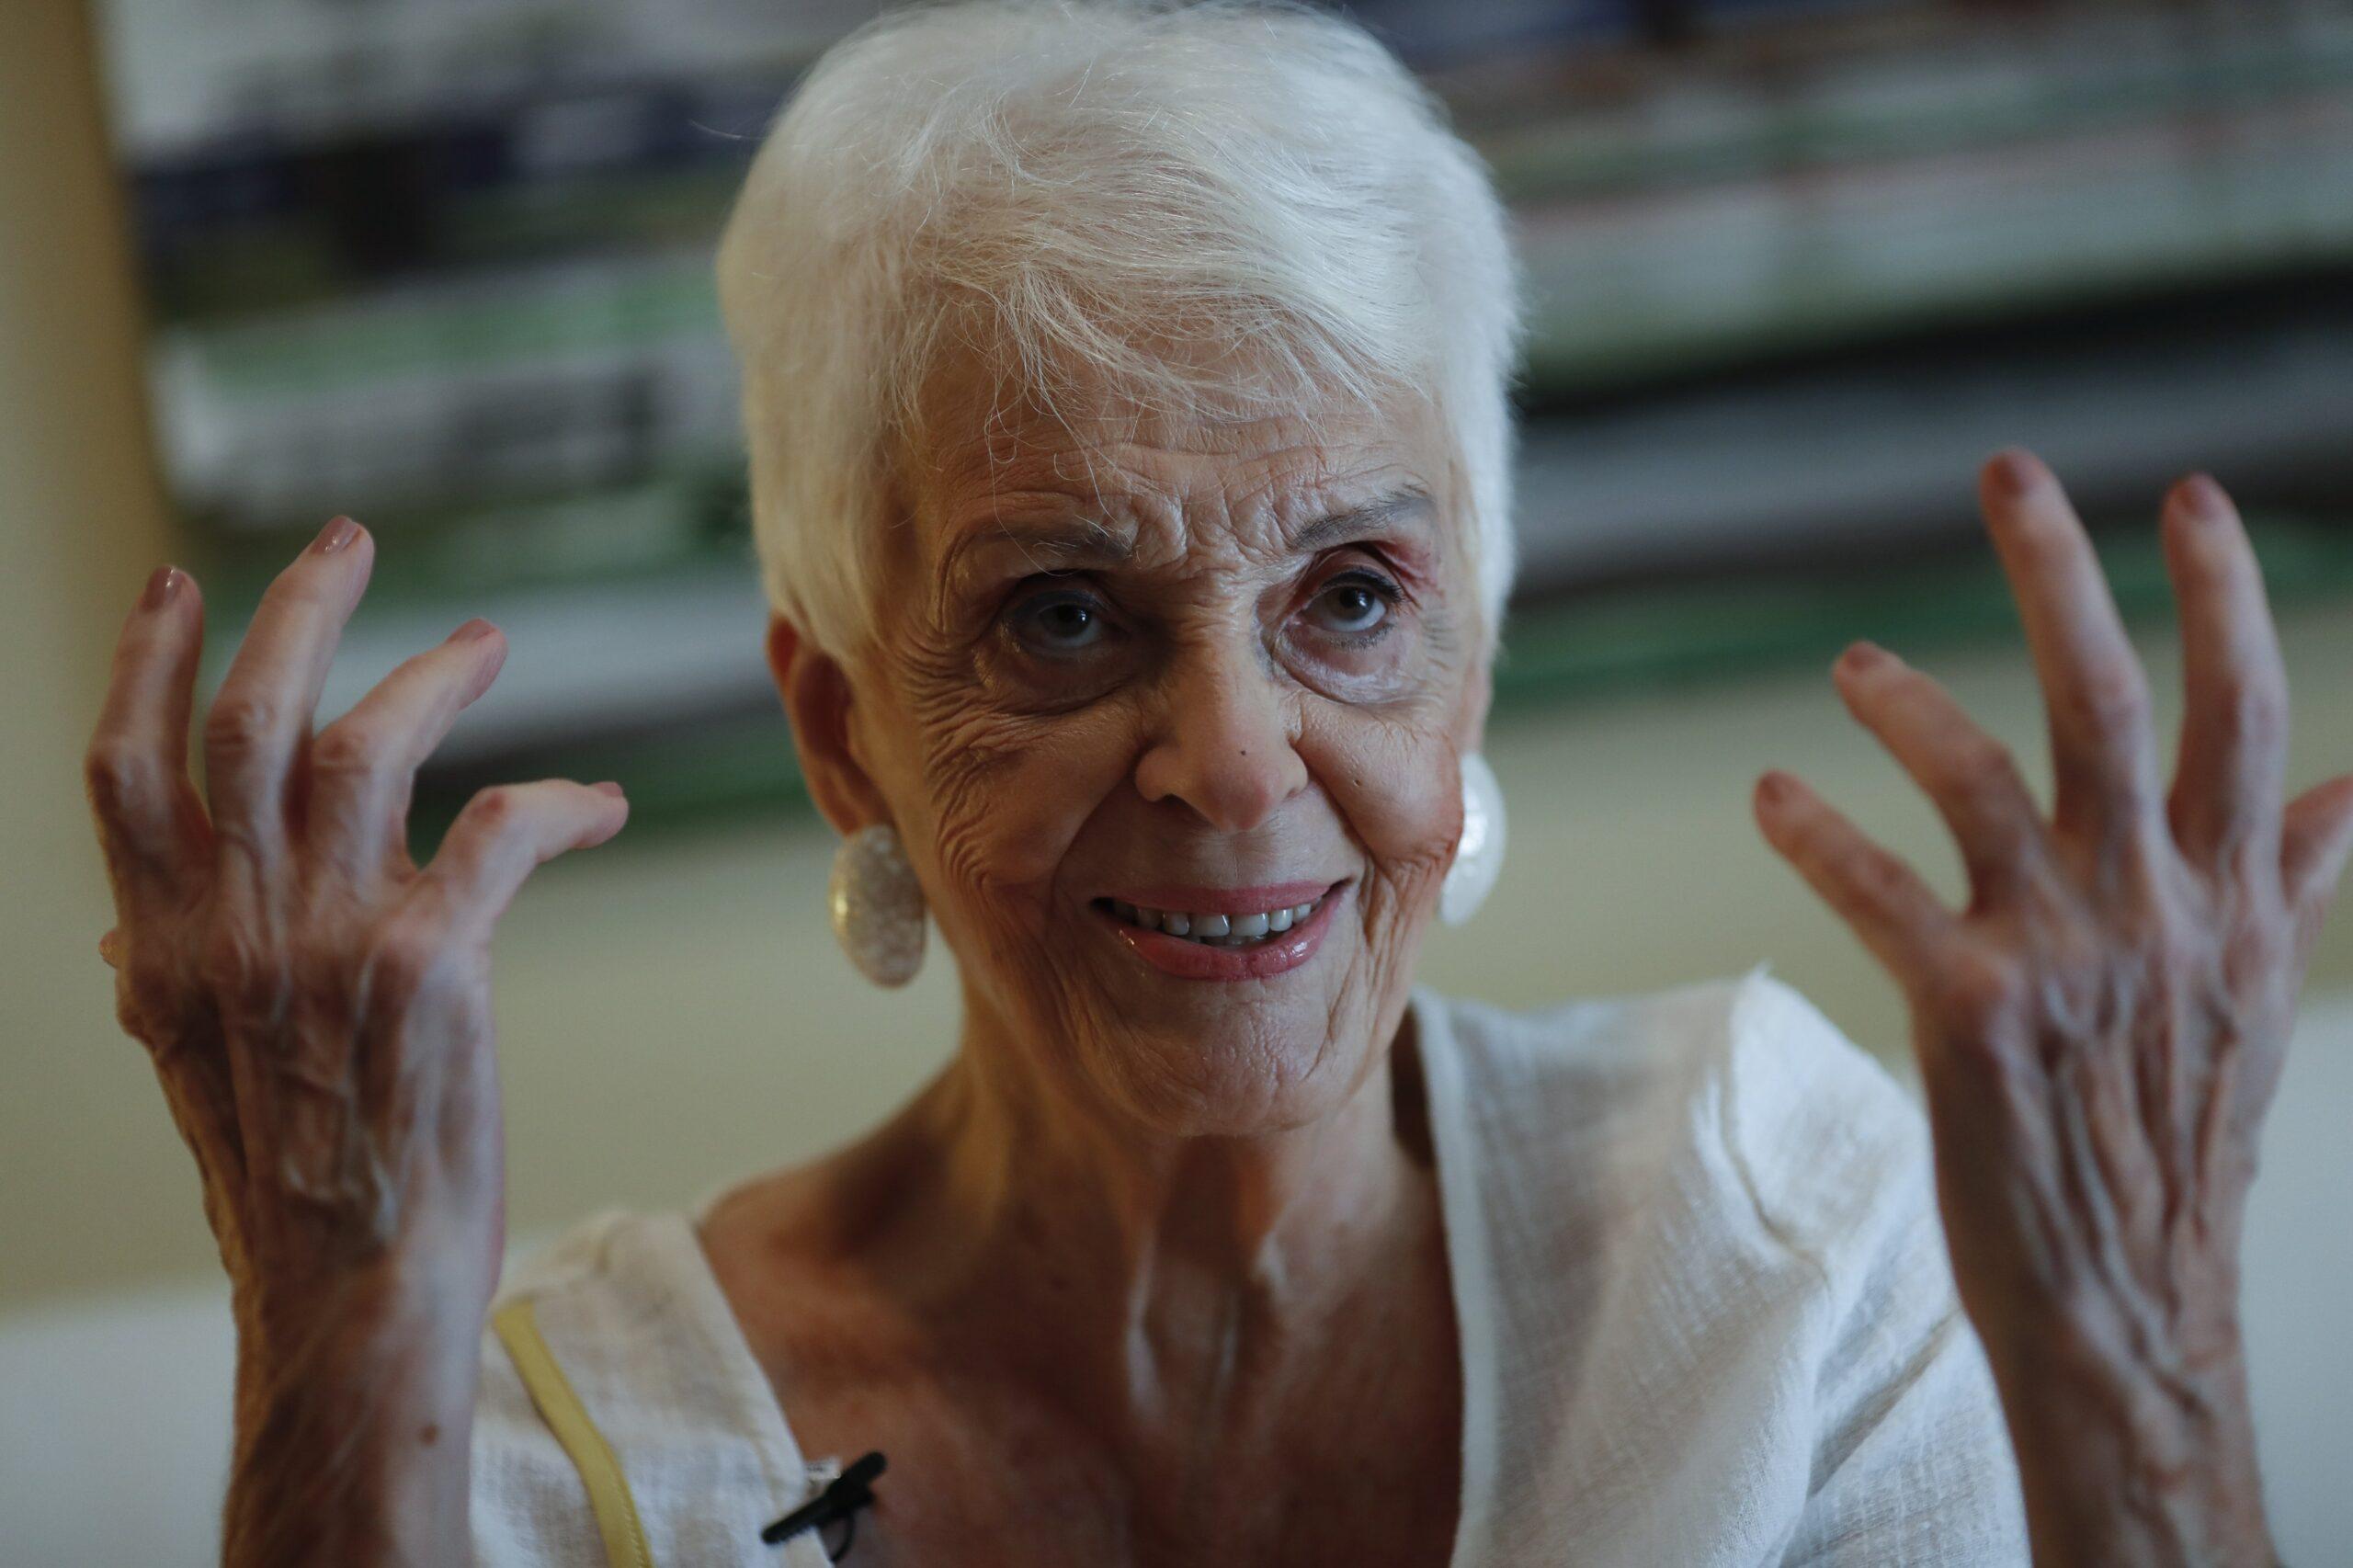 Graciela Fernández criticó al presidente